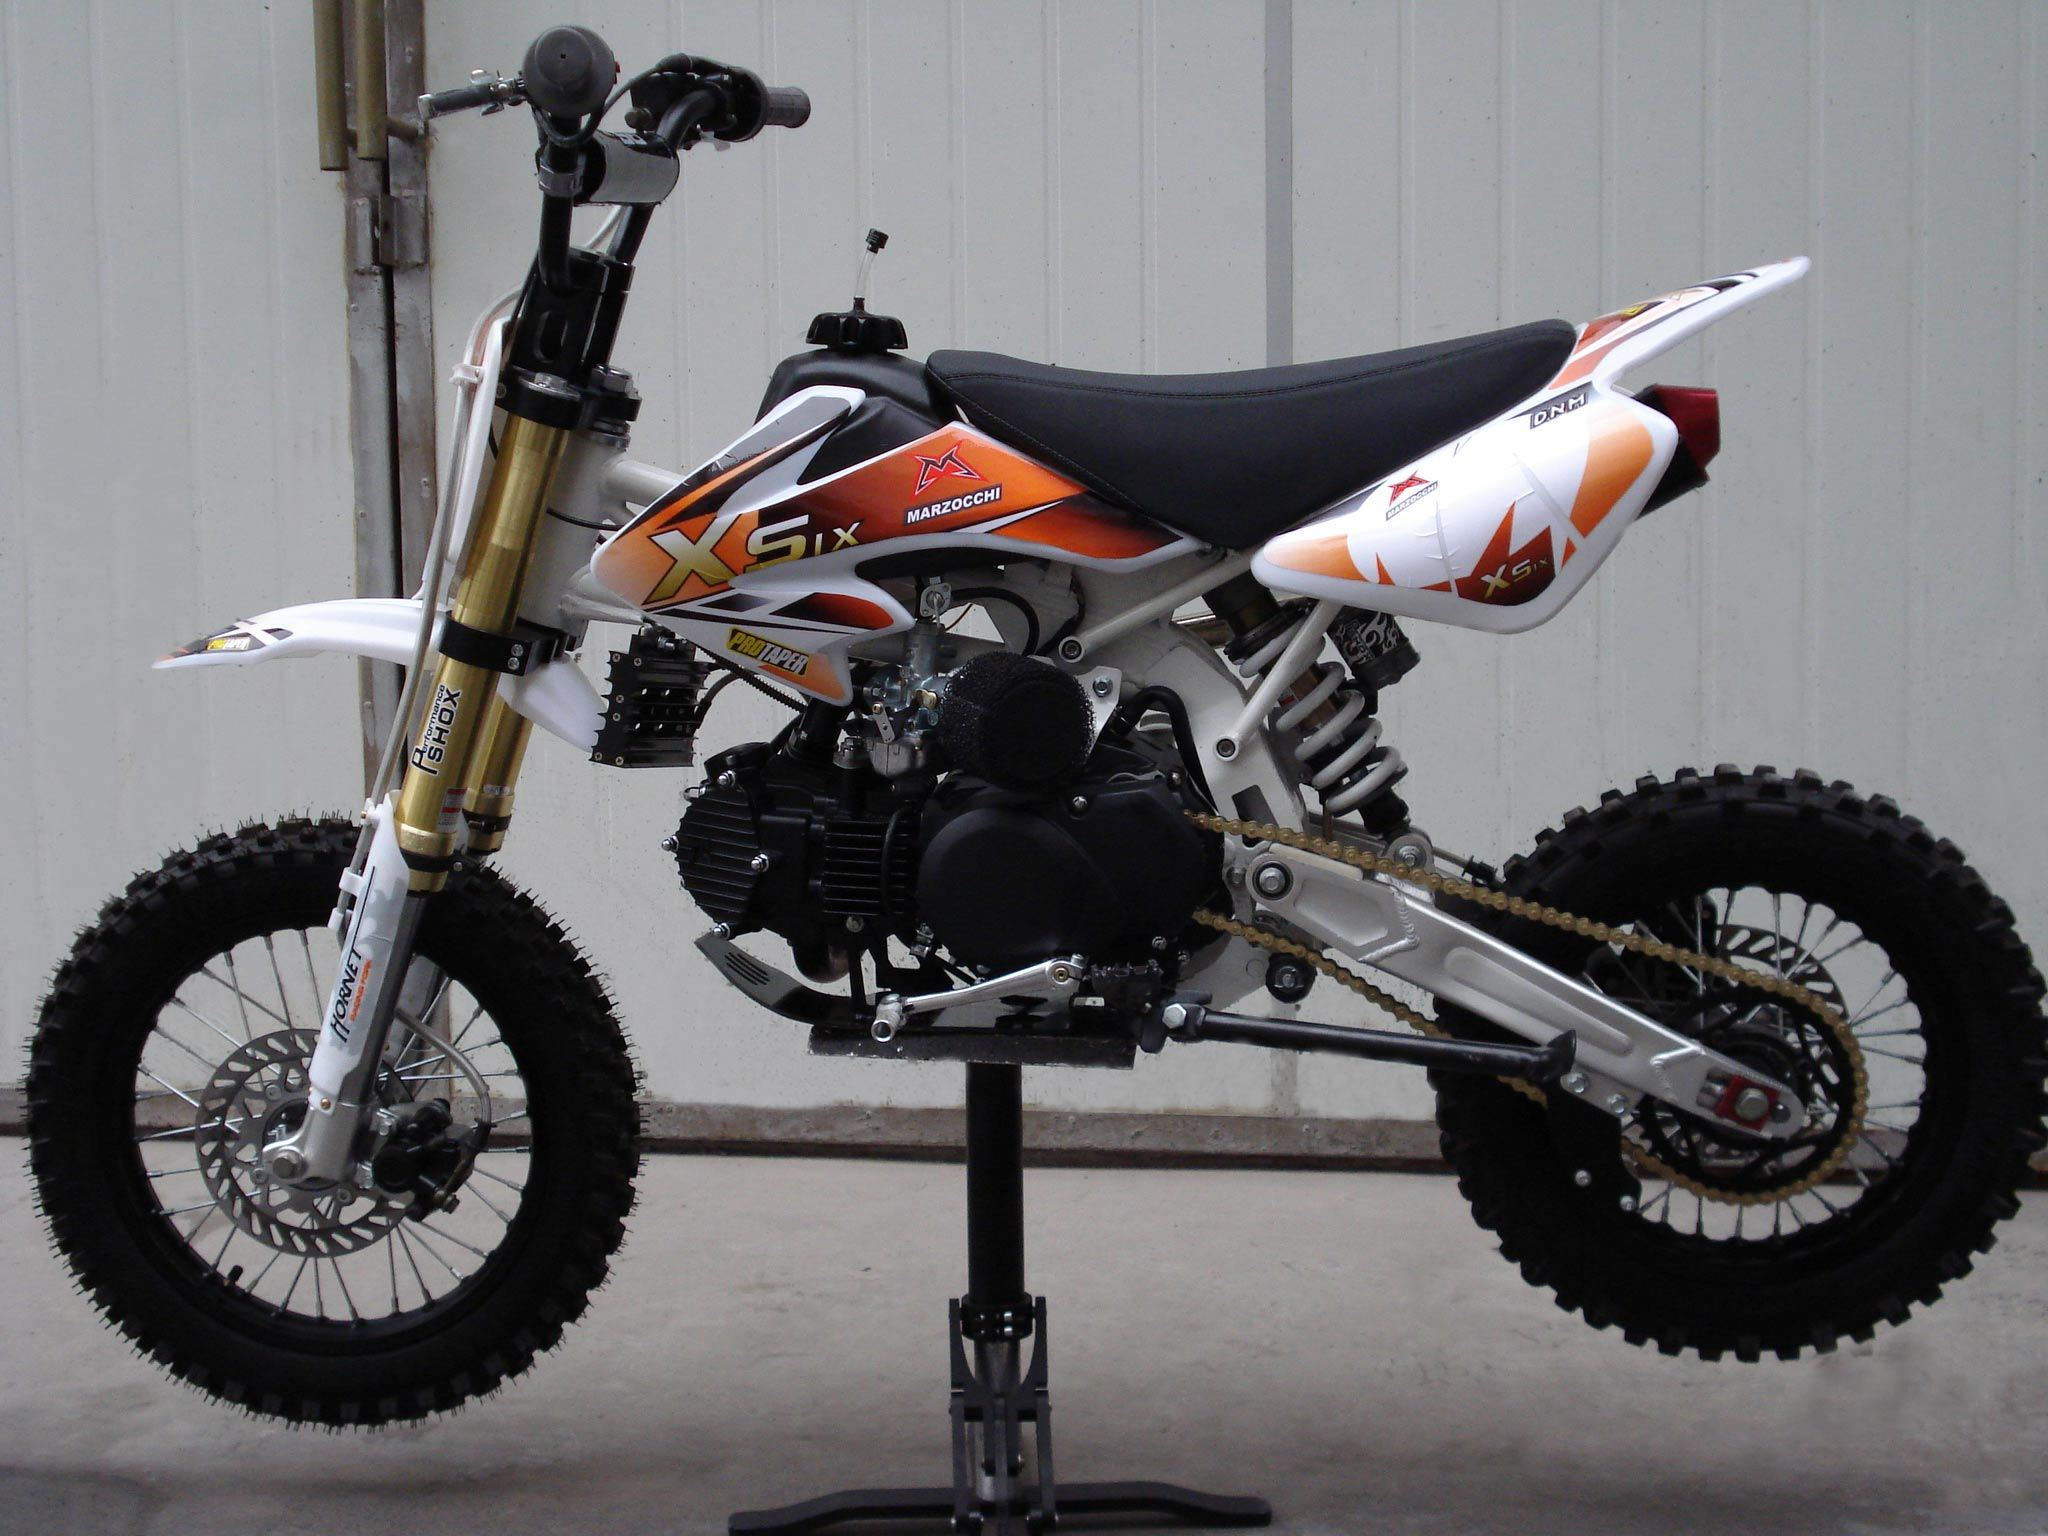 china 150cc dirt bike with chrome frame wbl 805 china dirt bike dirt bikes. Black Bedroom Furniture Sets. Home Design Ideas